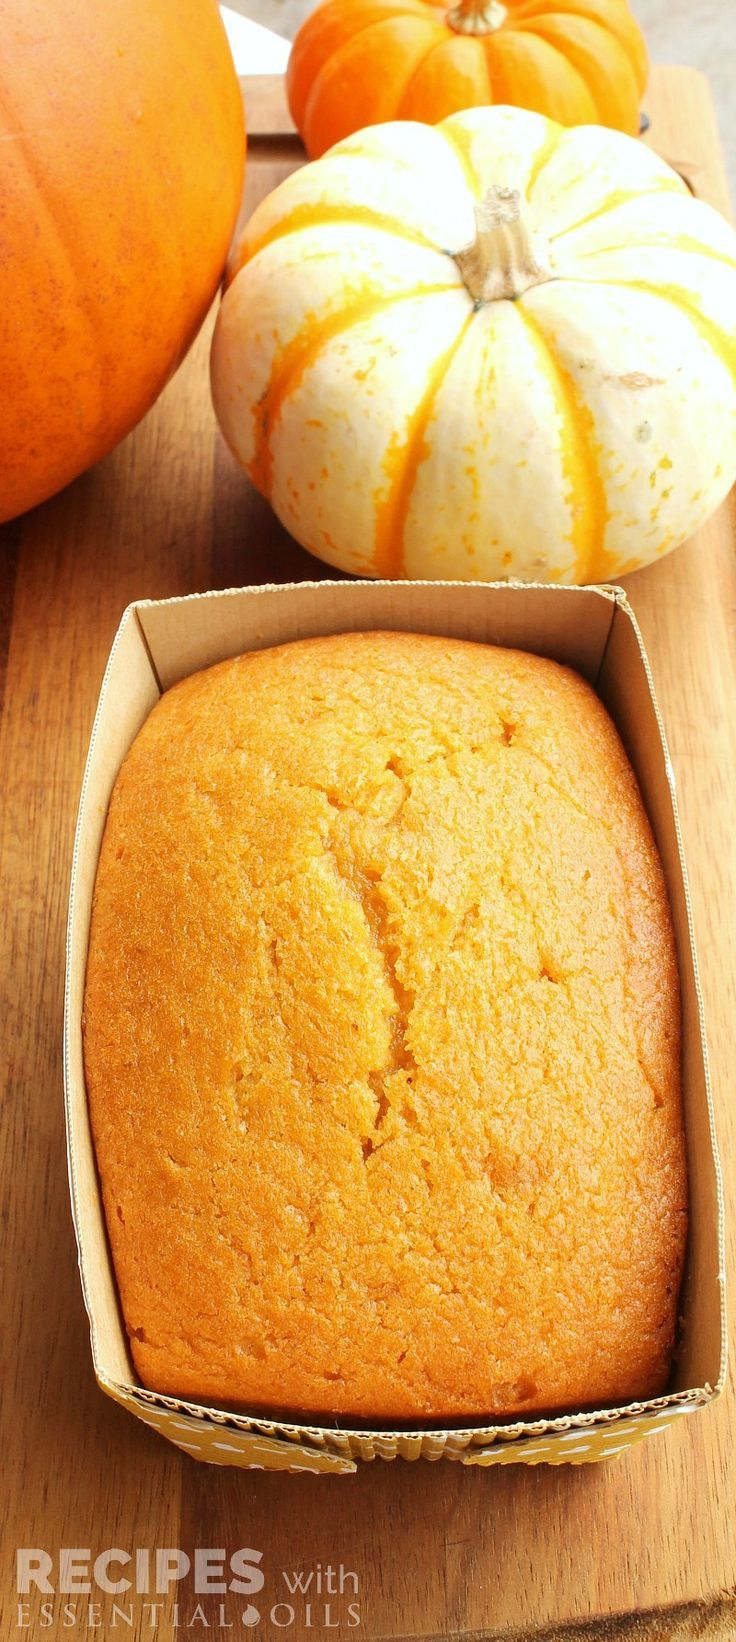 Delicious recipe for Pumpkin Bread with 5 Fall Essential Oil Favorites | RecipeswithEssentialOils.com